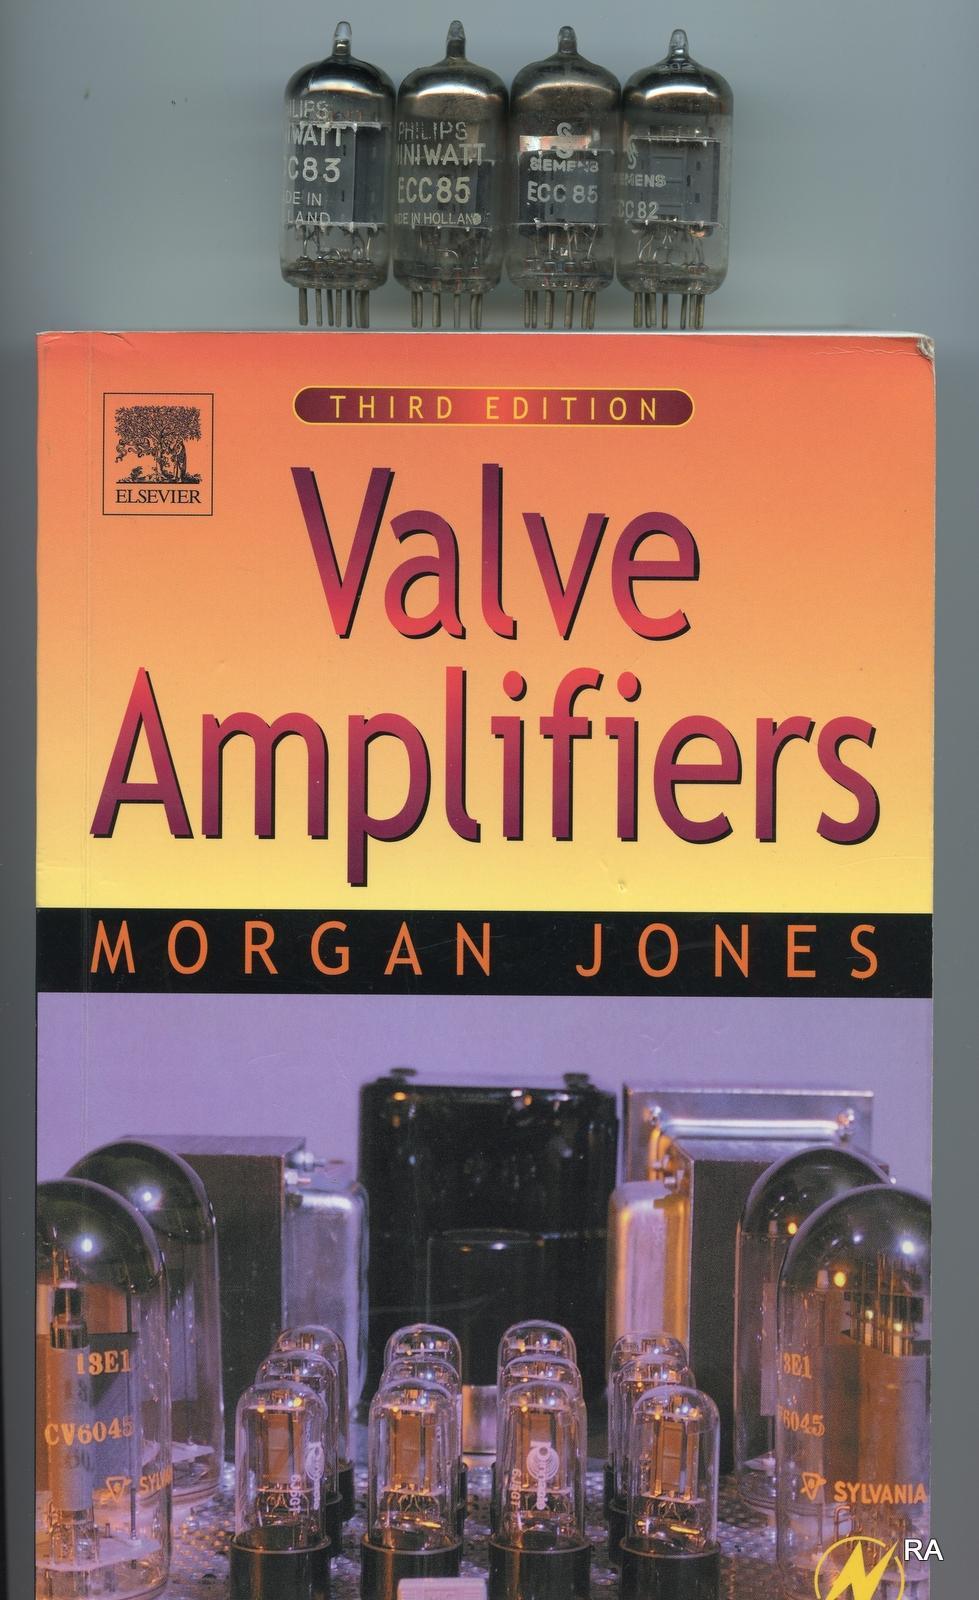 Designing valve amplifiers